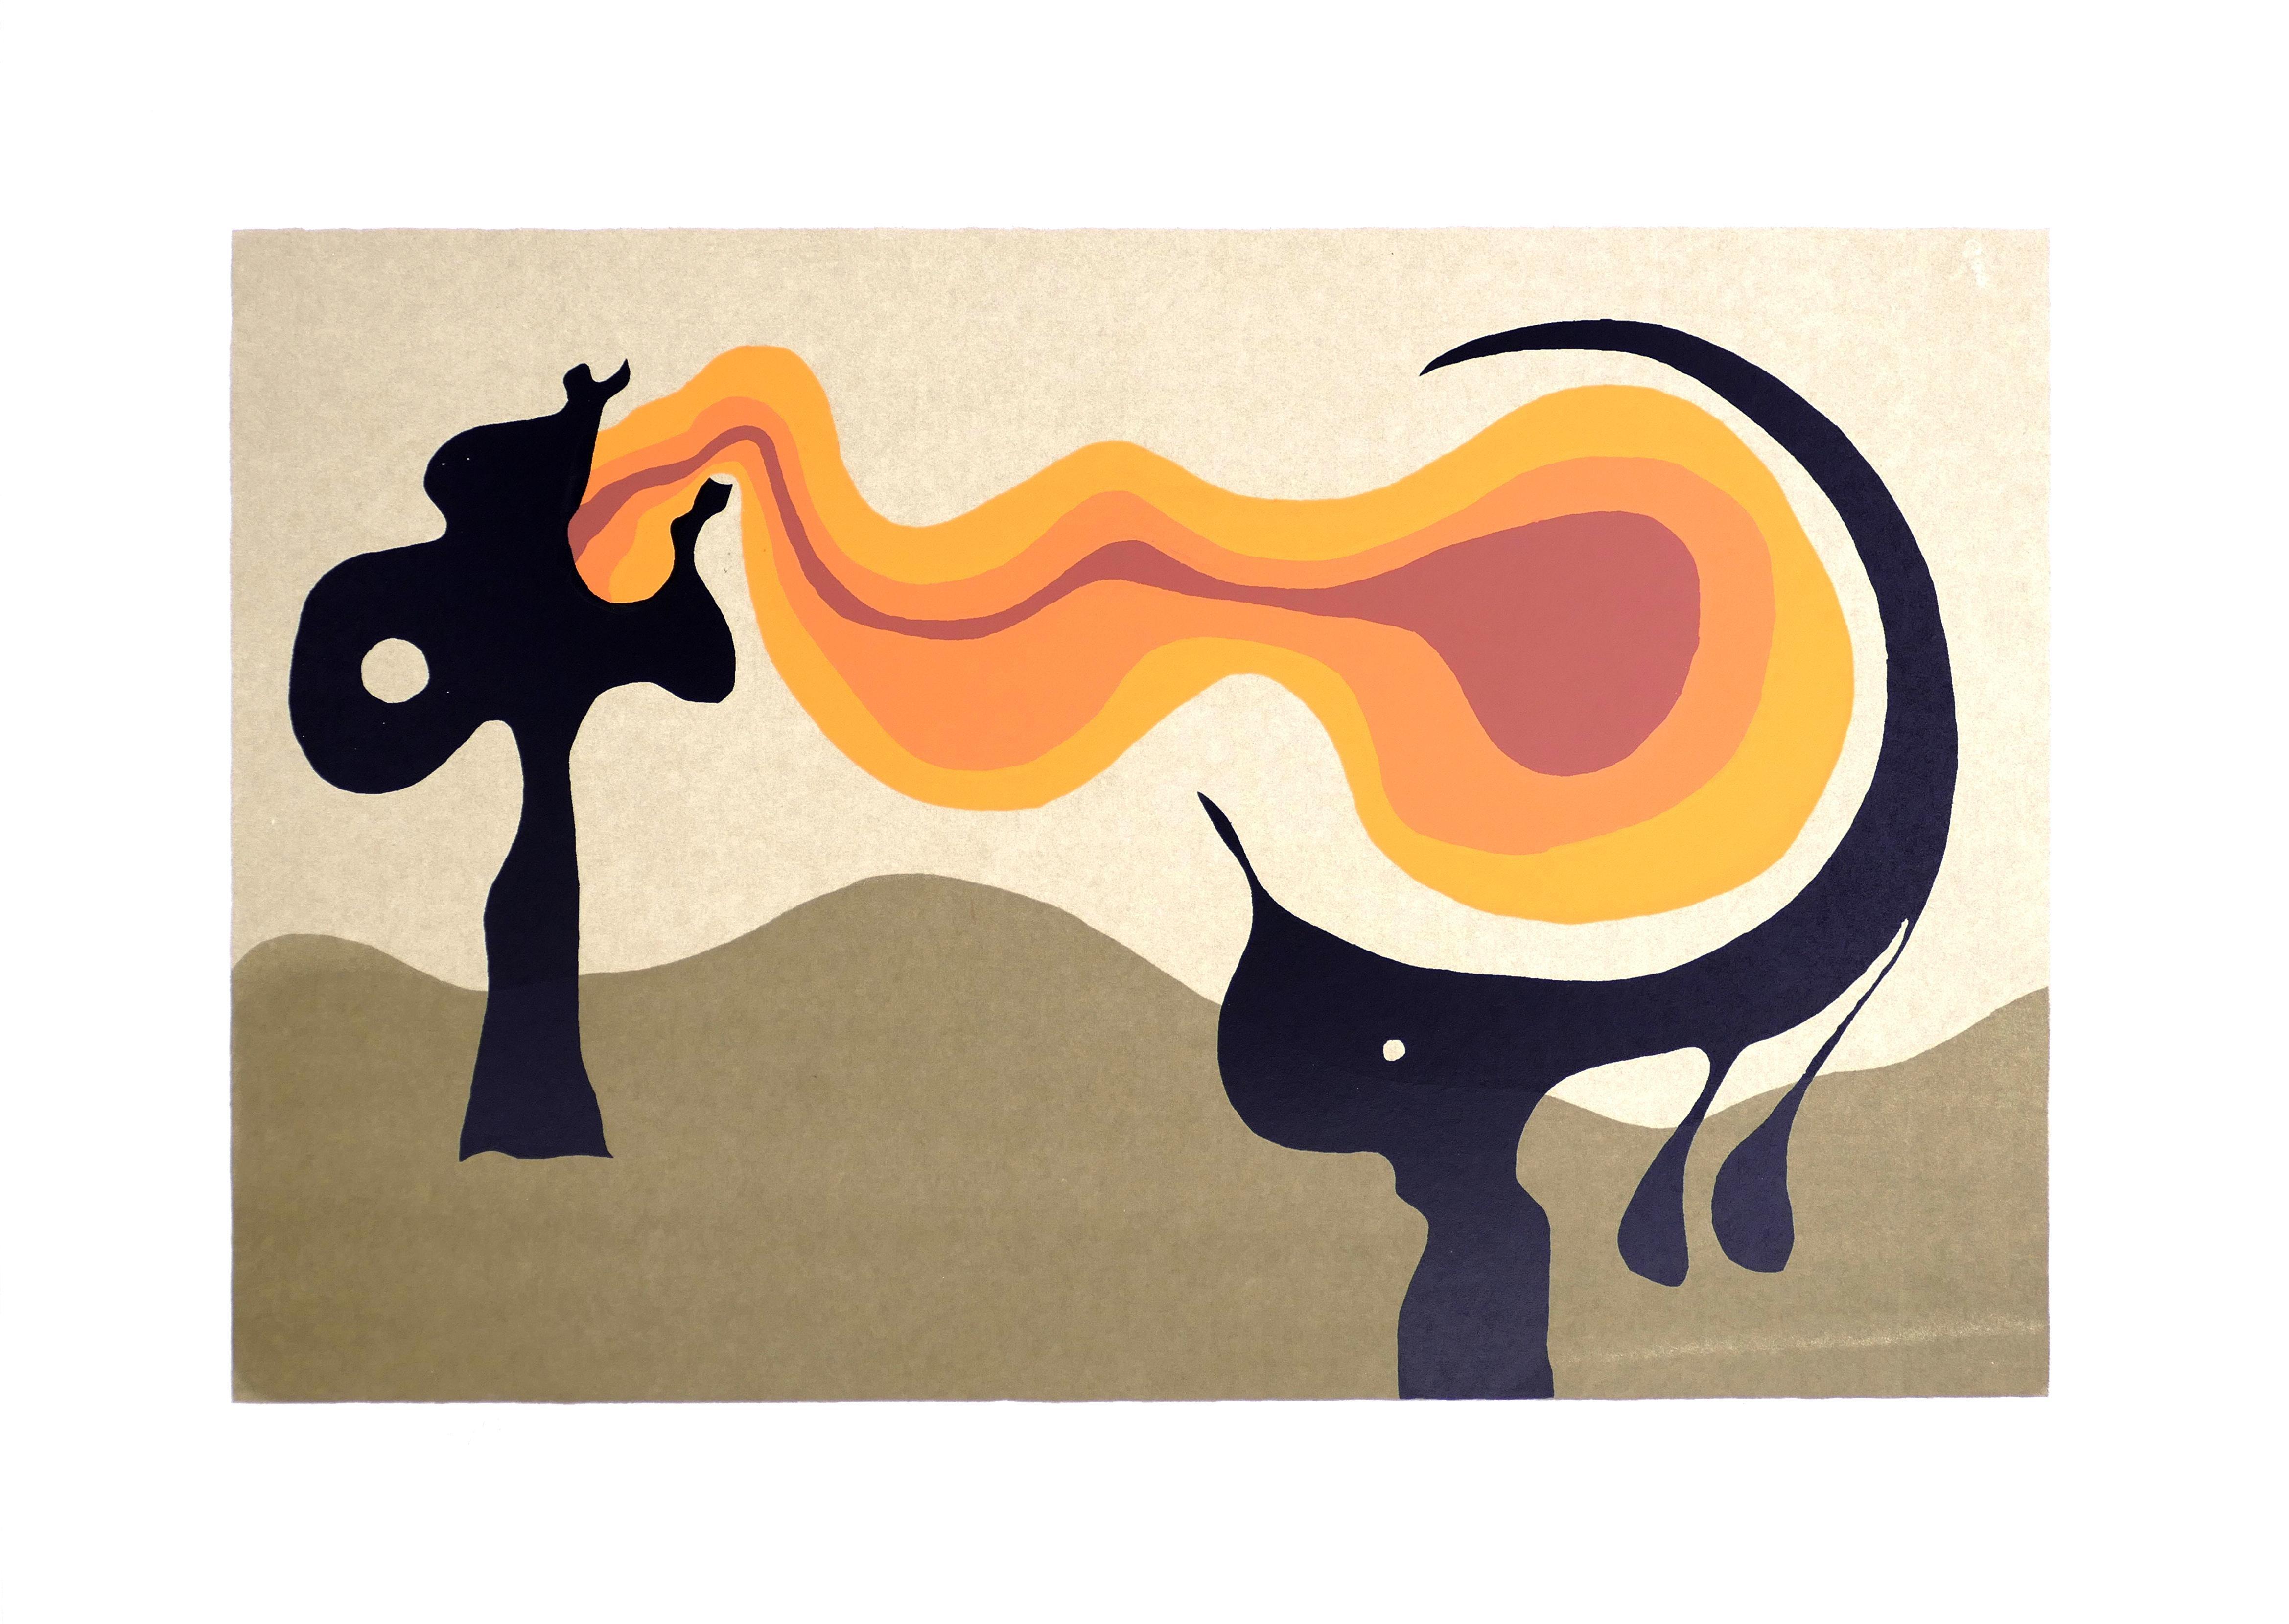 Fire Tongue - Original Screen Print by A. Knipschild - 1969